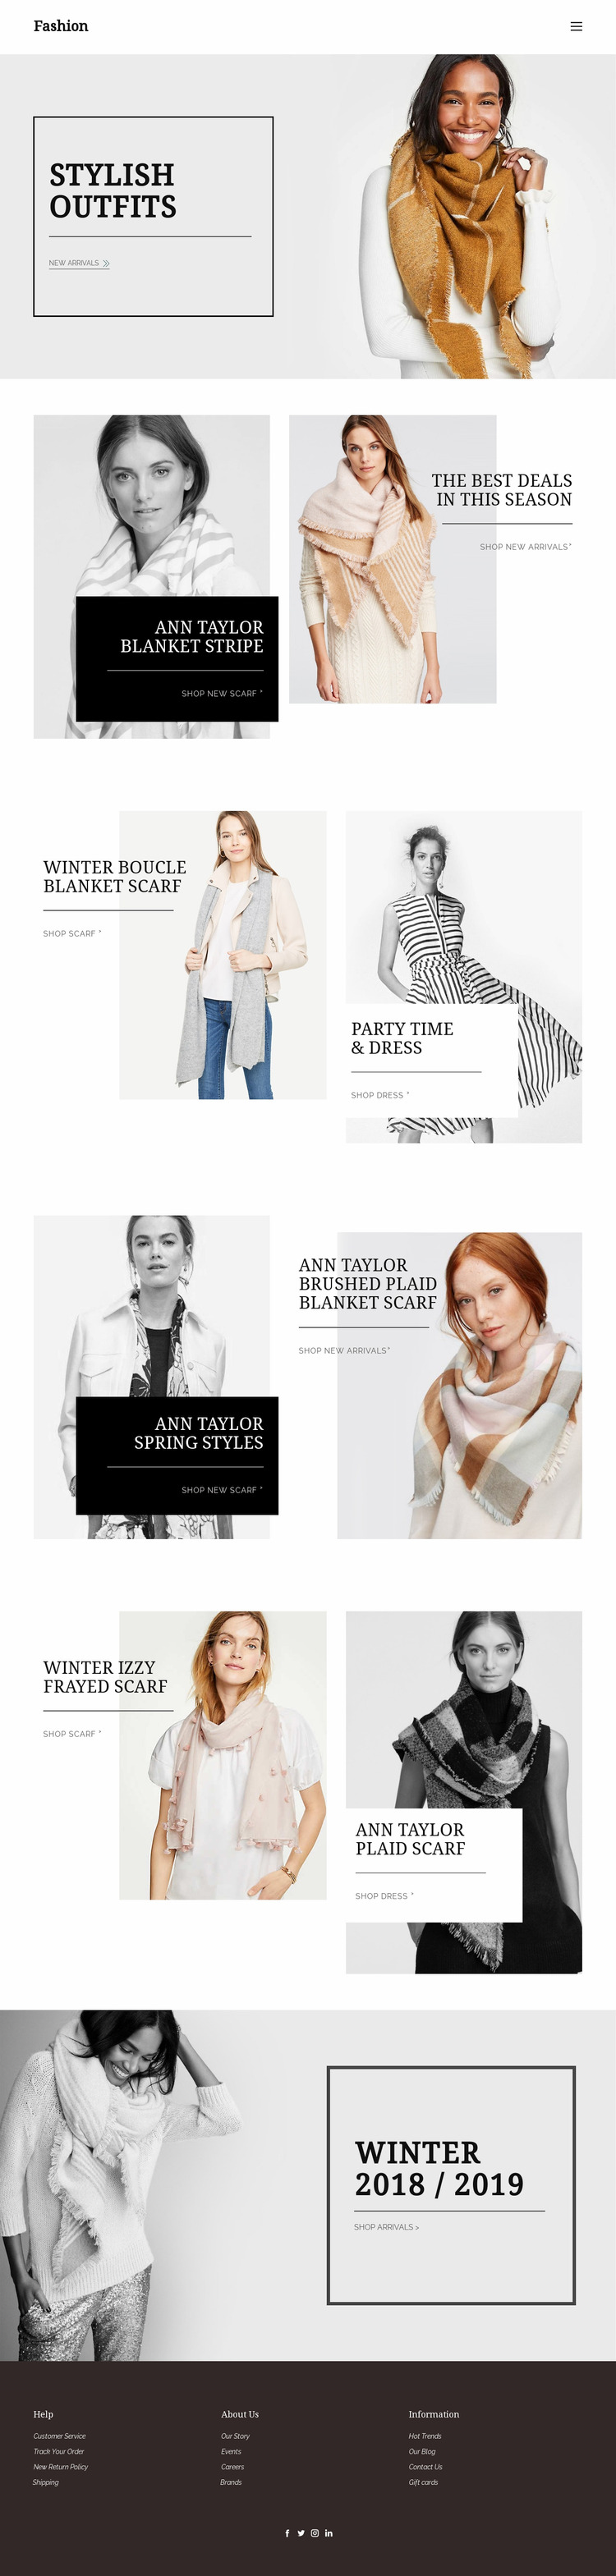 Personal shopper service WordPress Website Builder